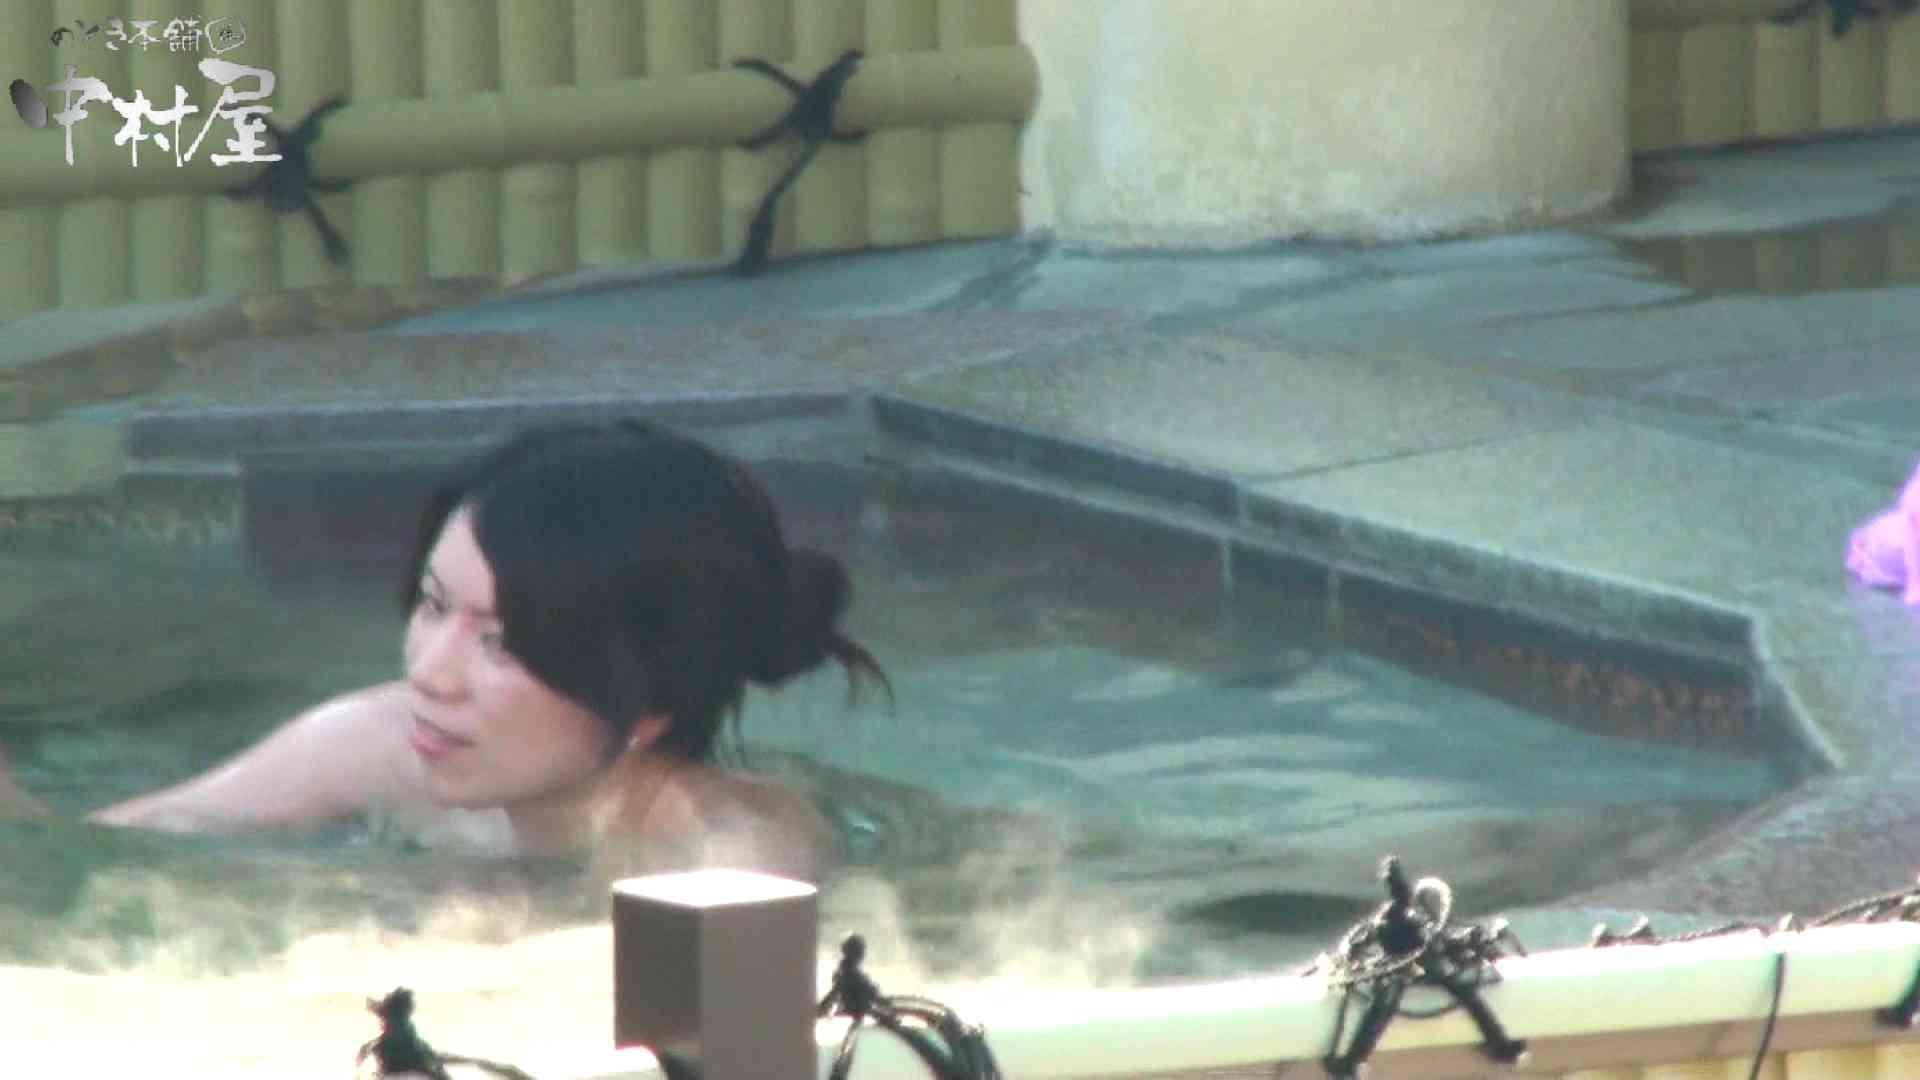 Aquaな露天風呂Vol.919 盗撮 おまんこ無修正動画無料 91連発 41